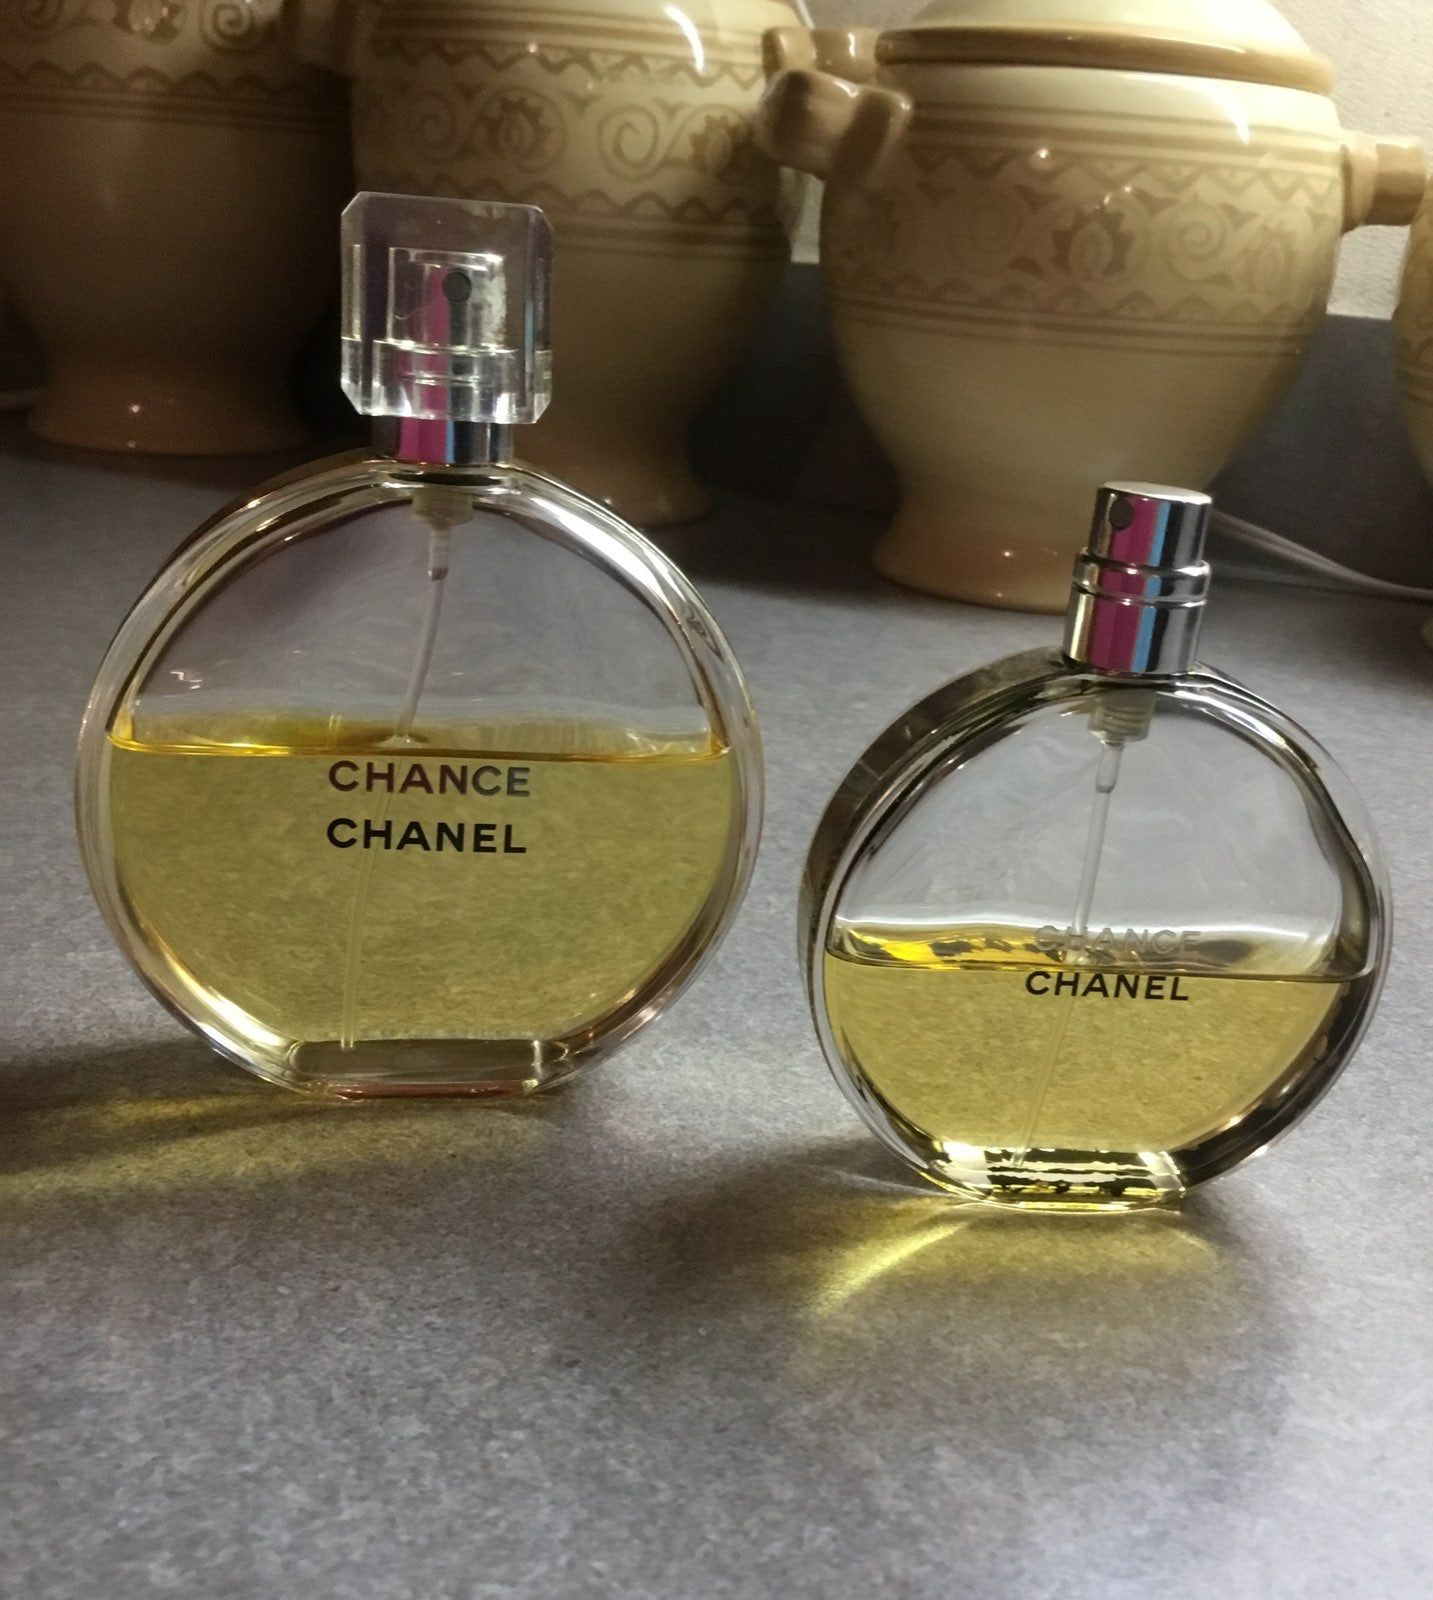 Set Of Two Chanel Chance 1 3 4 Fl Oz Bottle Over Half Full 2 1 7 Fl Oz Bottle About Half Full Both Bottles Chanel Perfume Bottles Metal Bands